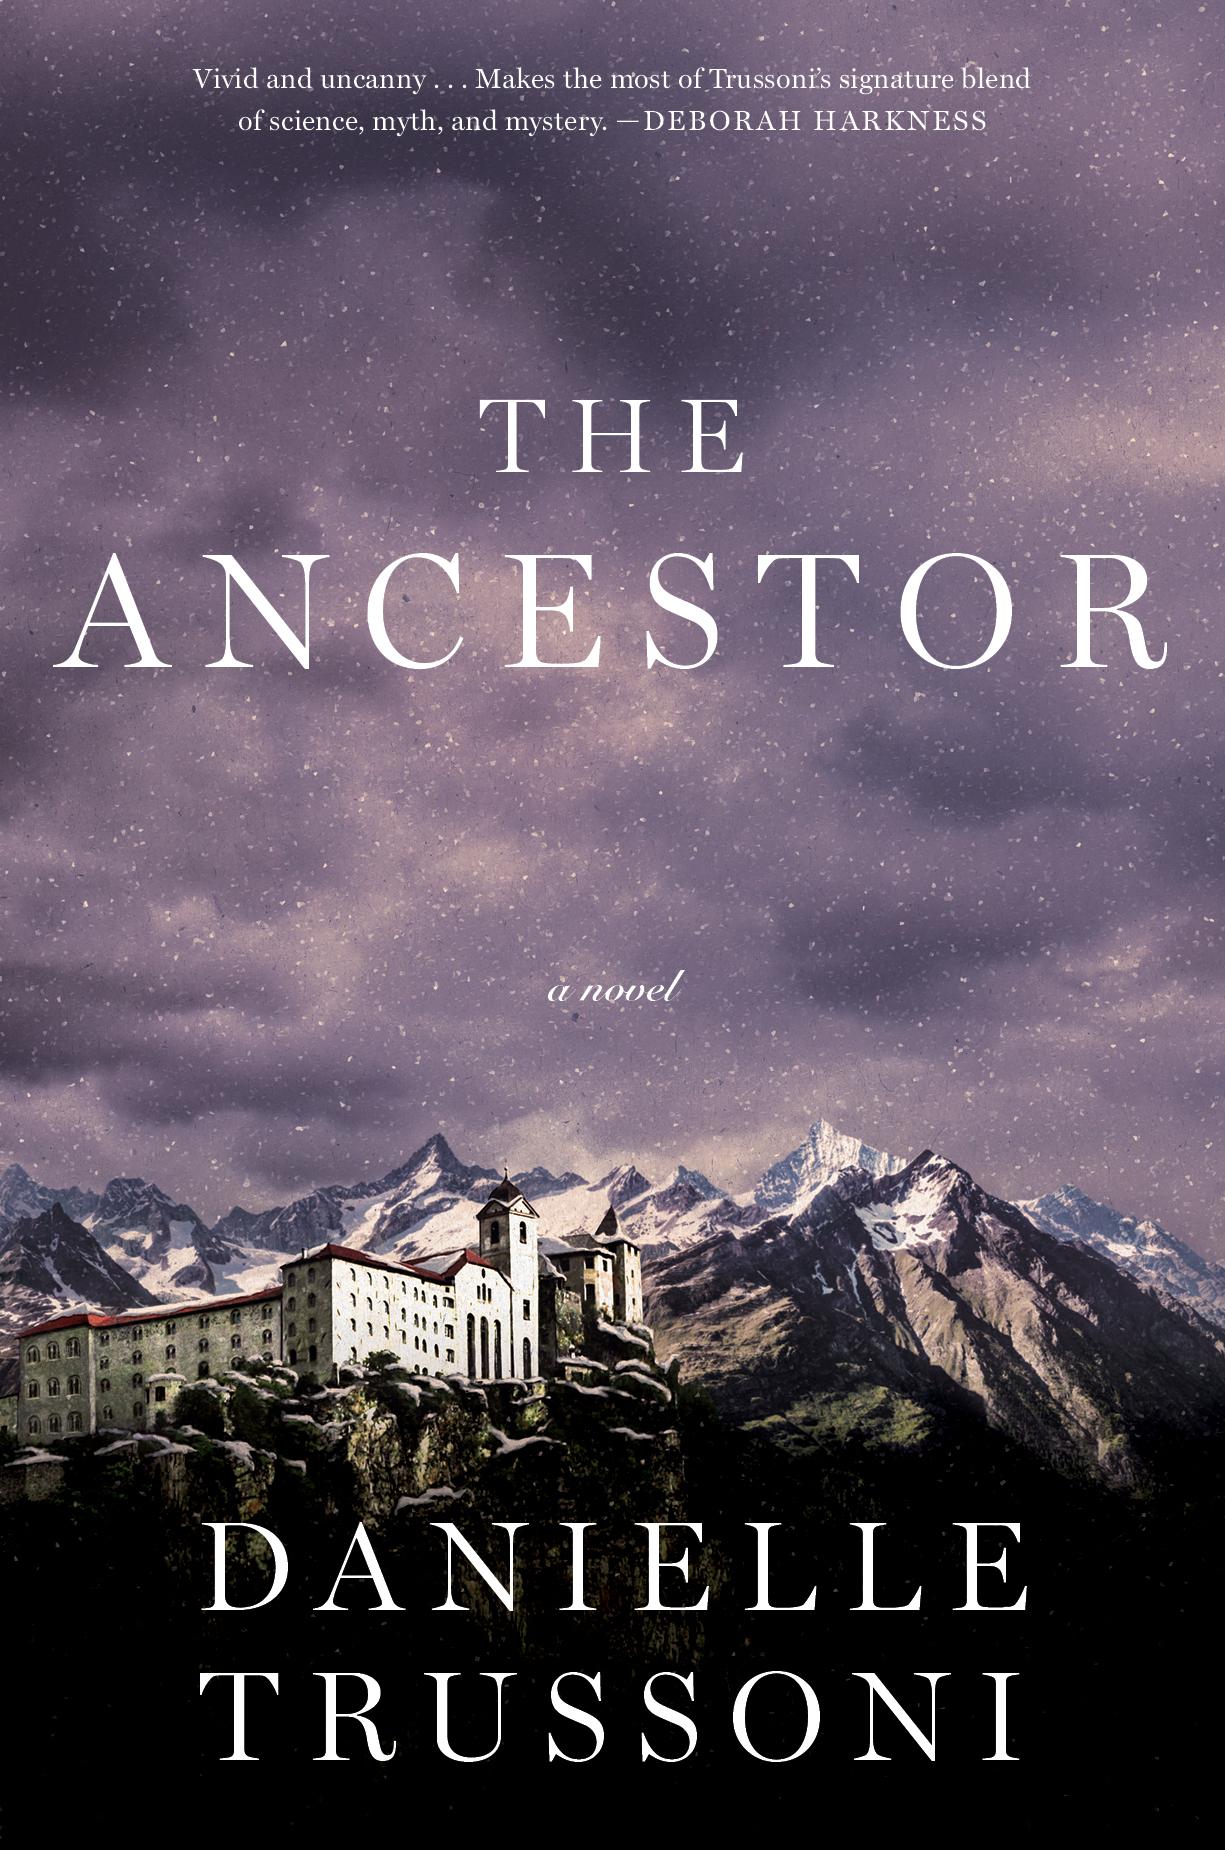 The Ancestor